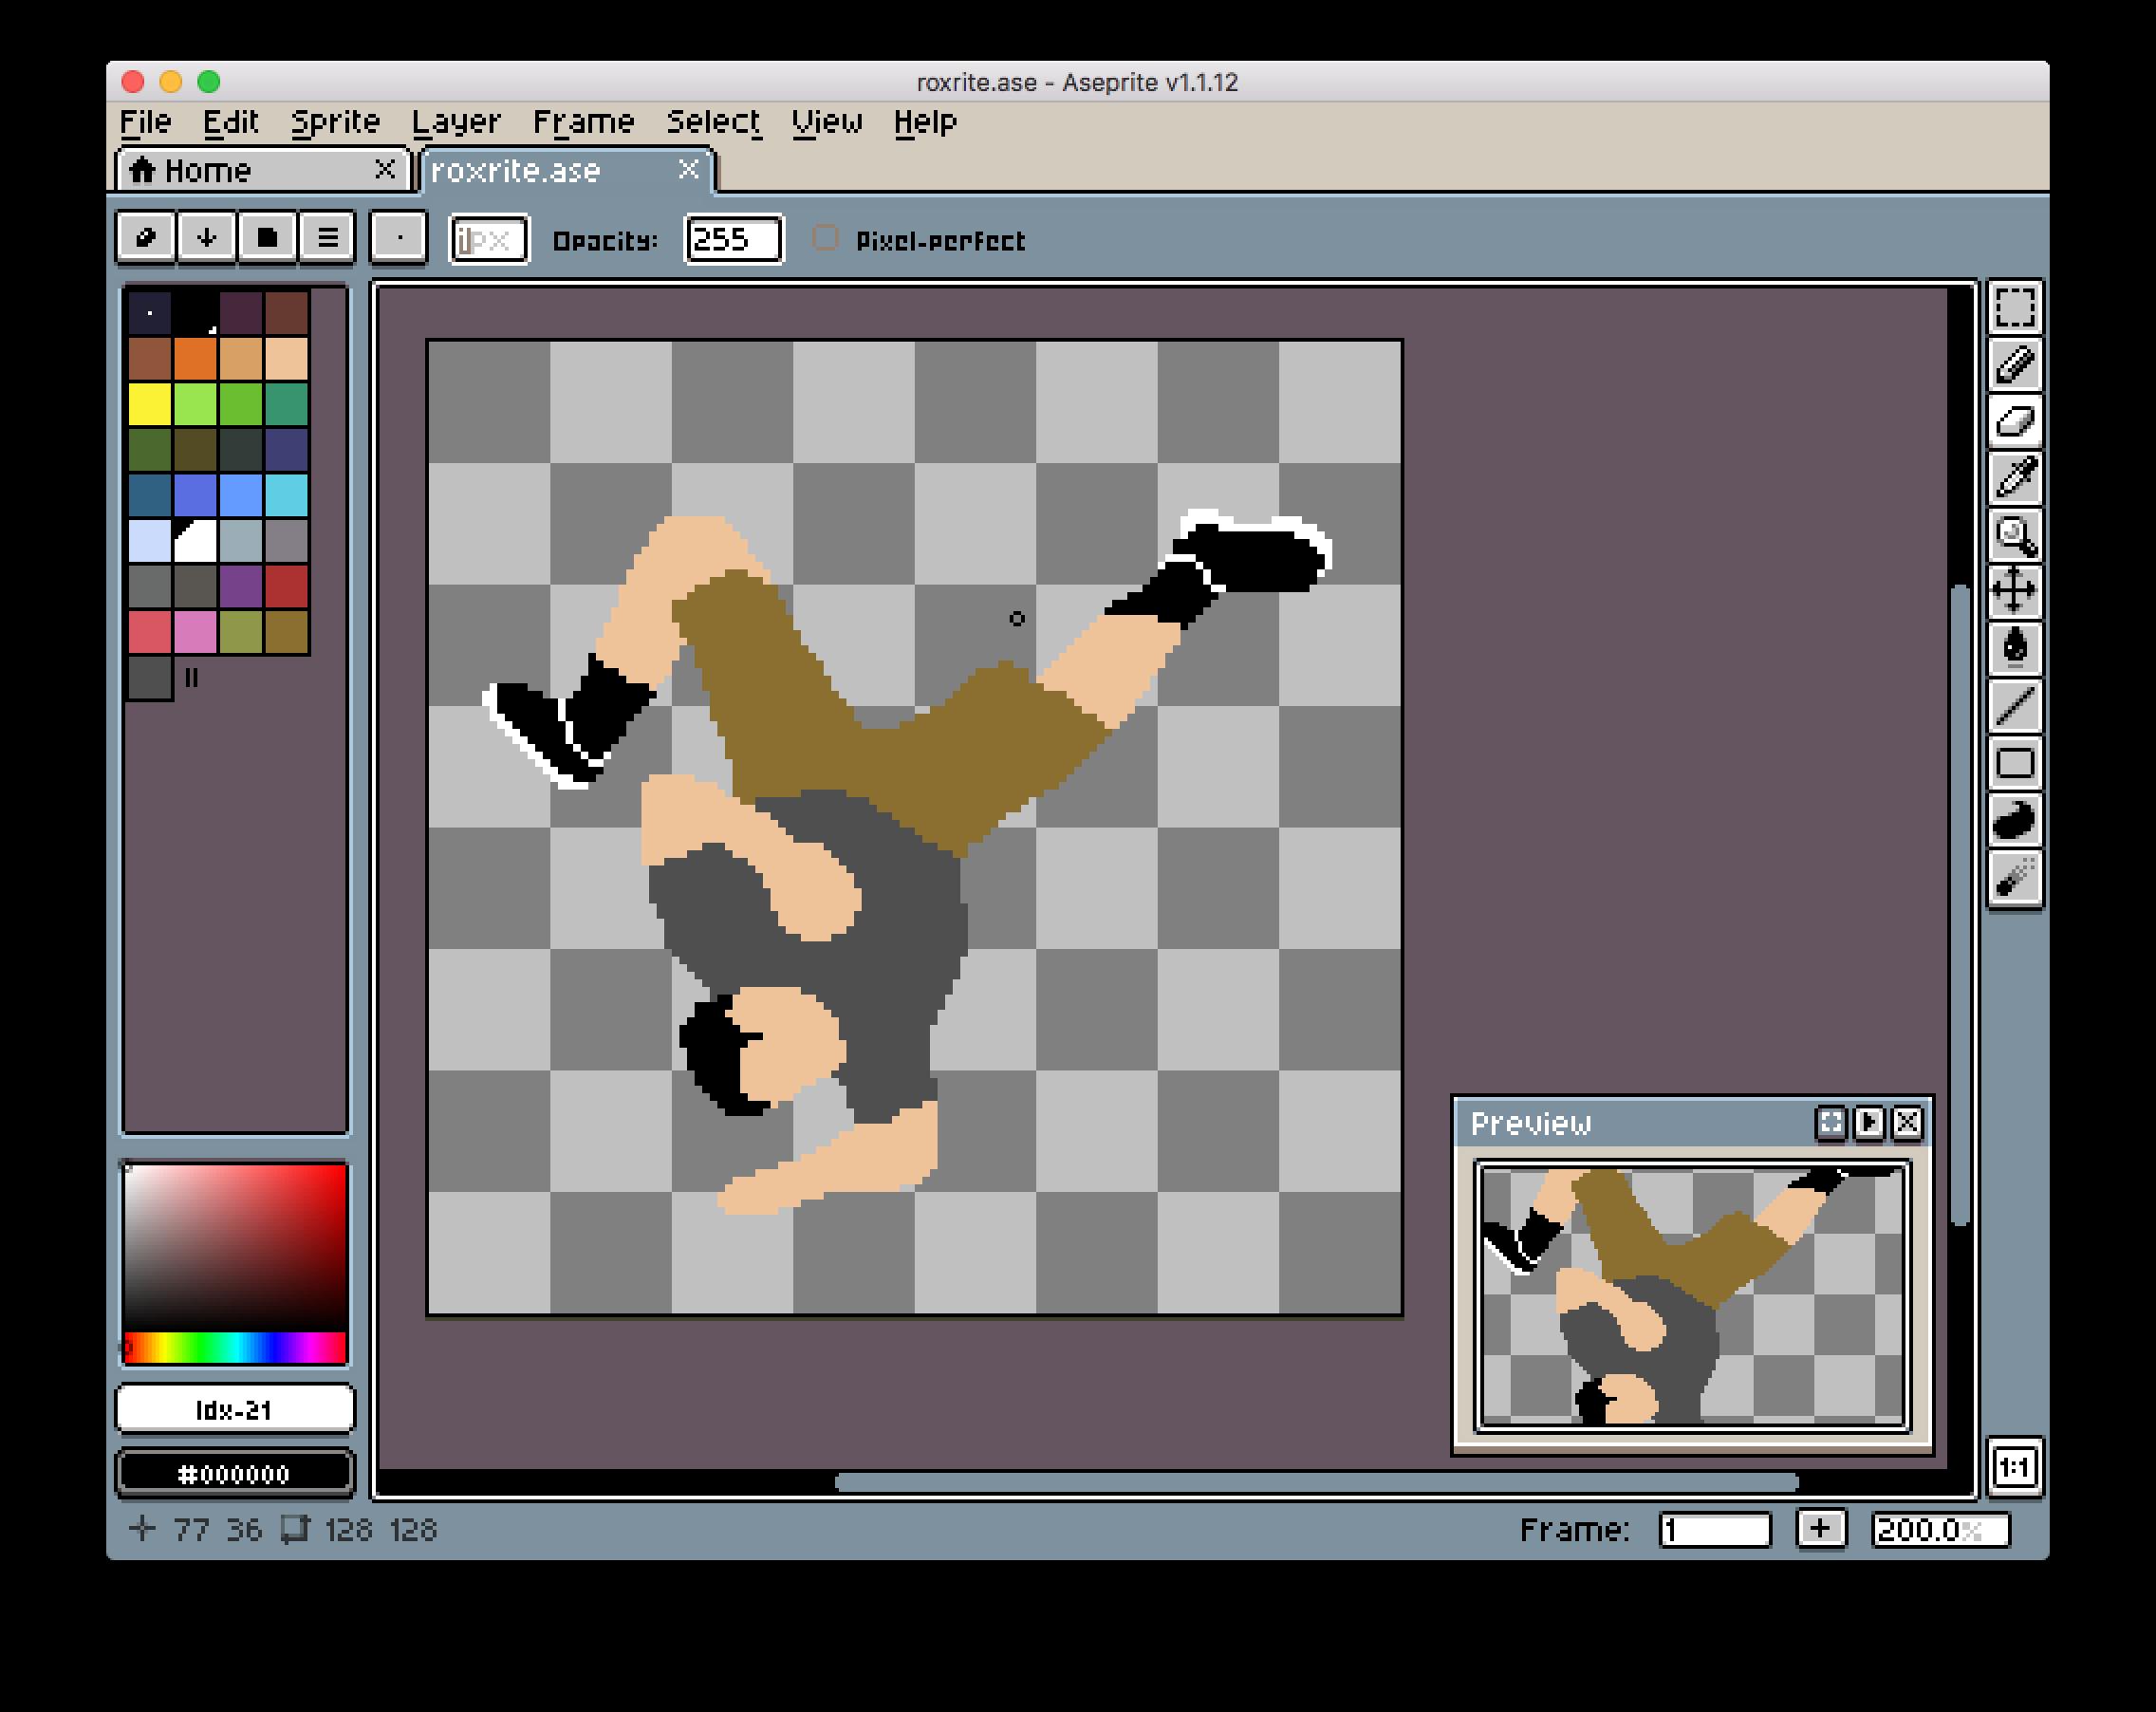 The process of drawing my first bboy pixel art — AKA: Making a pixel